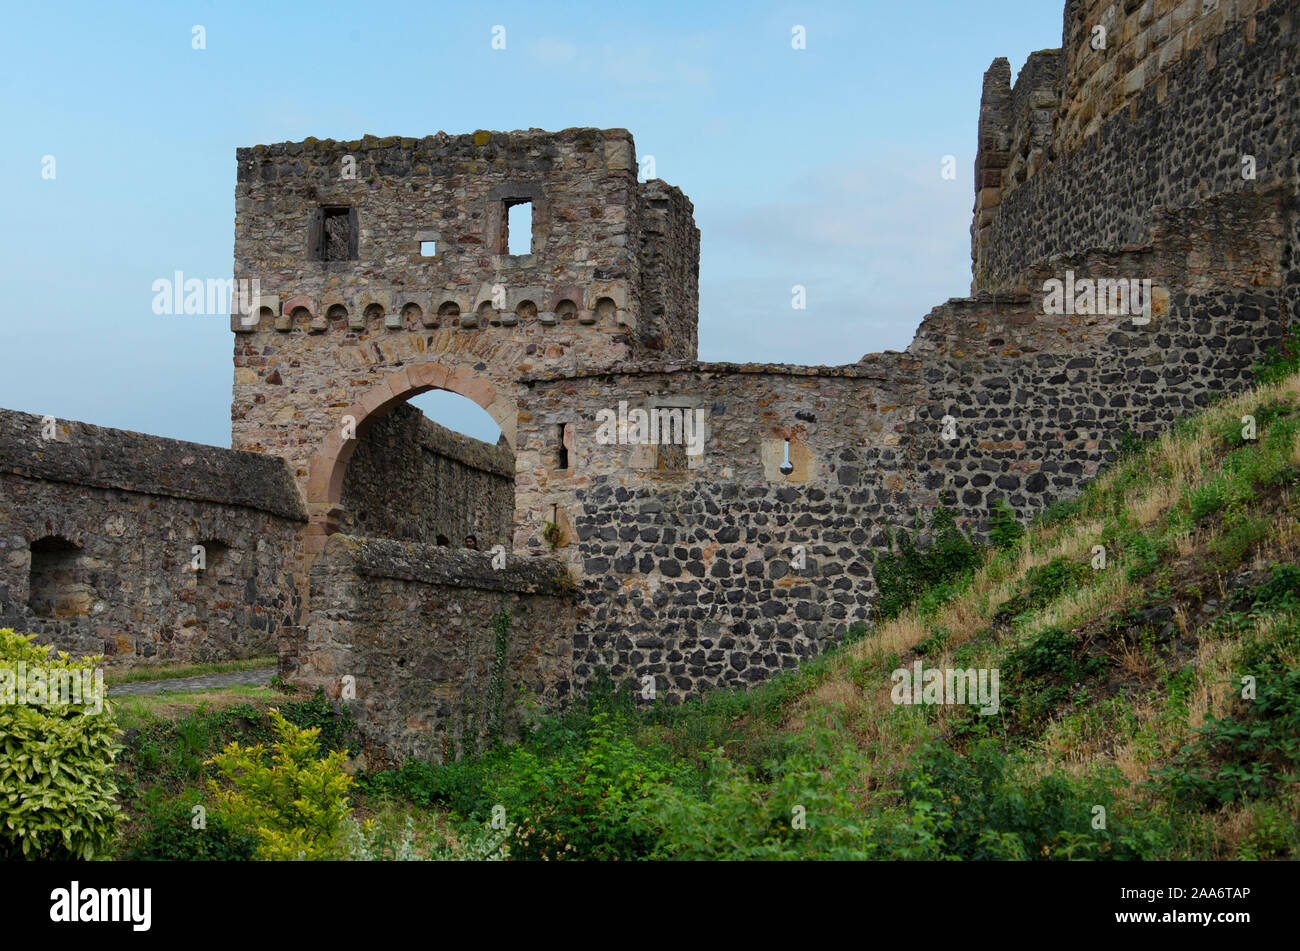 Münzenberg Castle, Wetteraukreis, Hesse, Germany, Europe Stock Photo